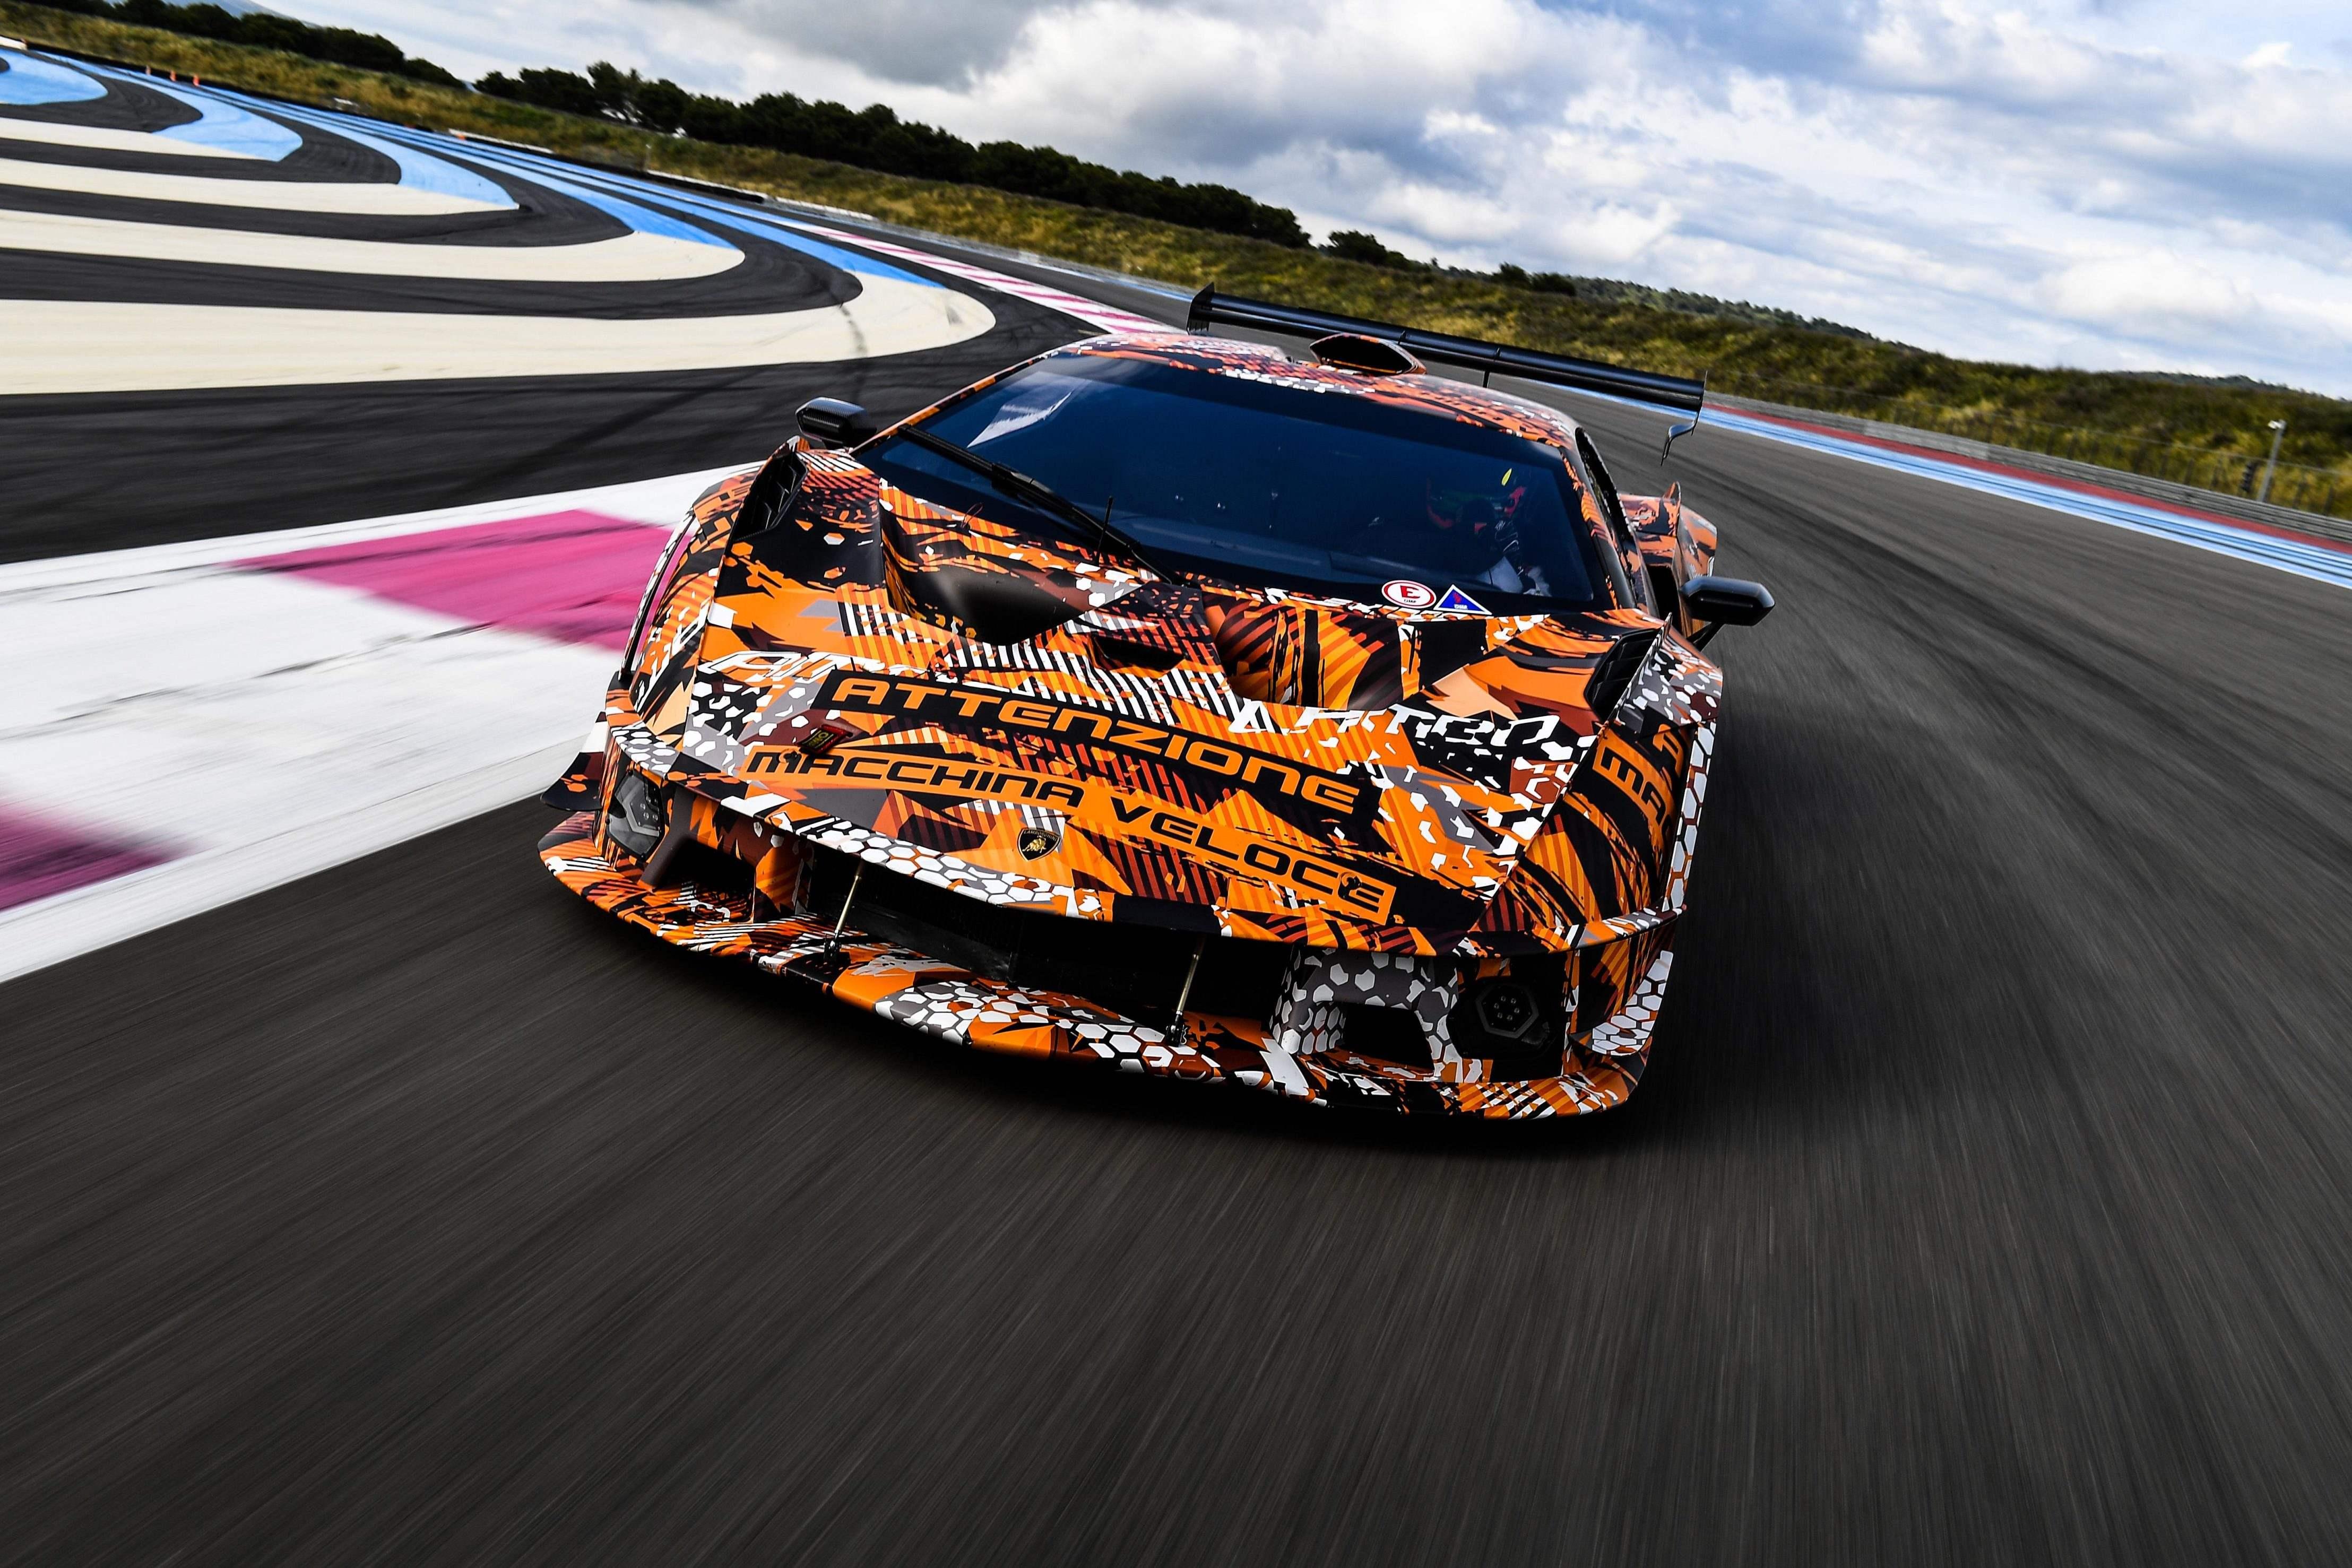 Lamborghini SCV12 hypercar